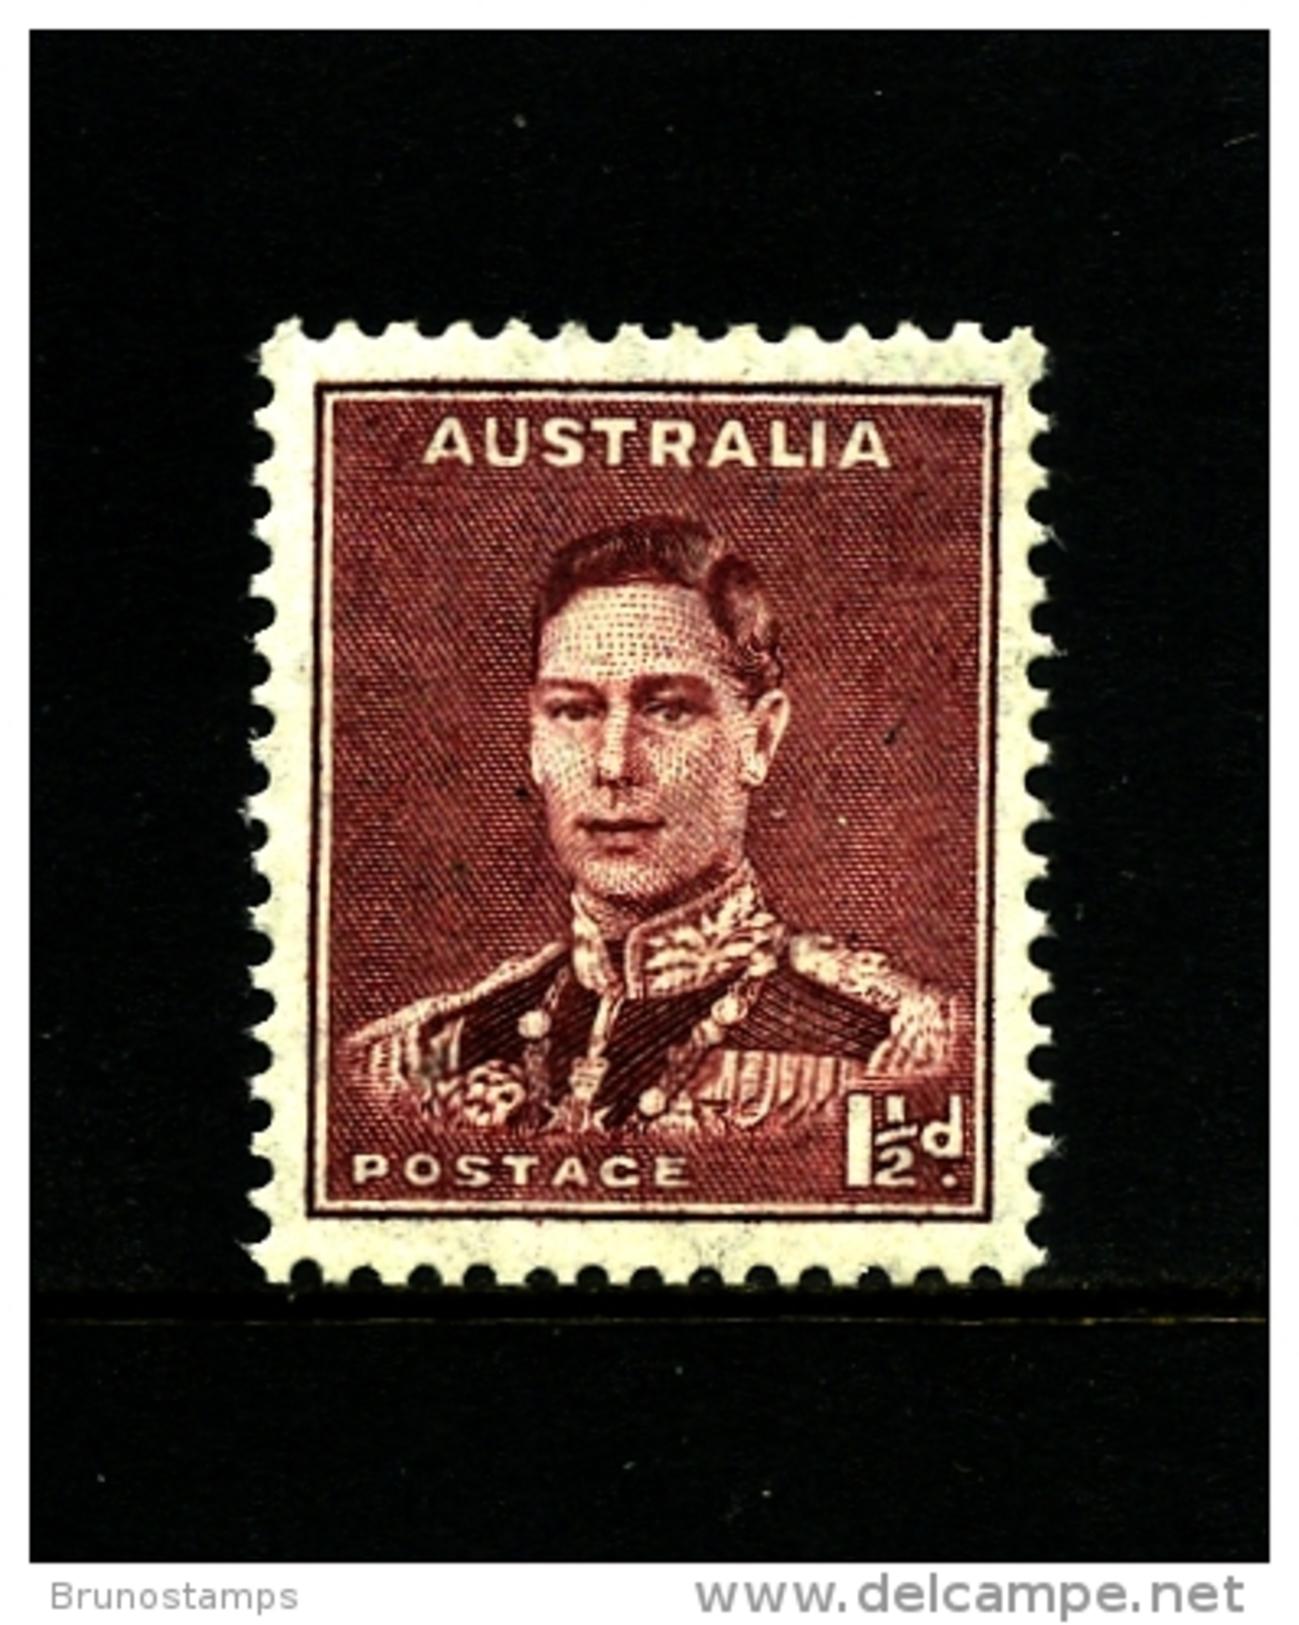 AUSTRALIA - 1937  DEFINITIVE  1 1/2 D  PERF. 13 1/2 X 14  MINT NH  SG 166 - 1937-52 George VI